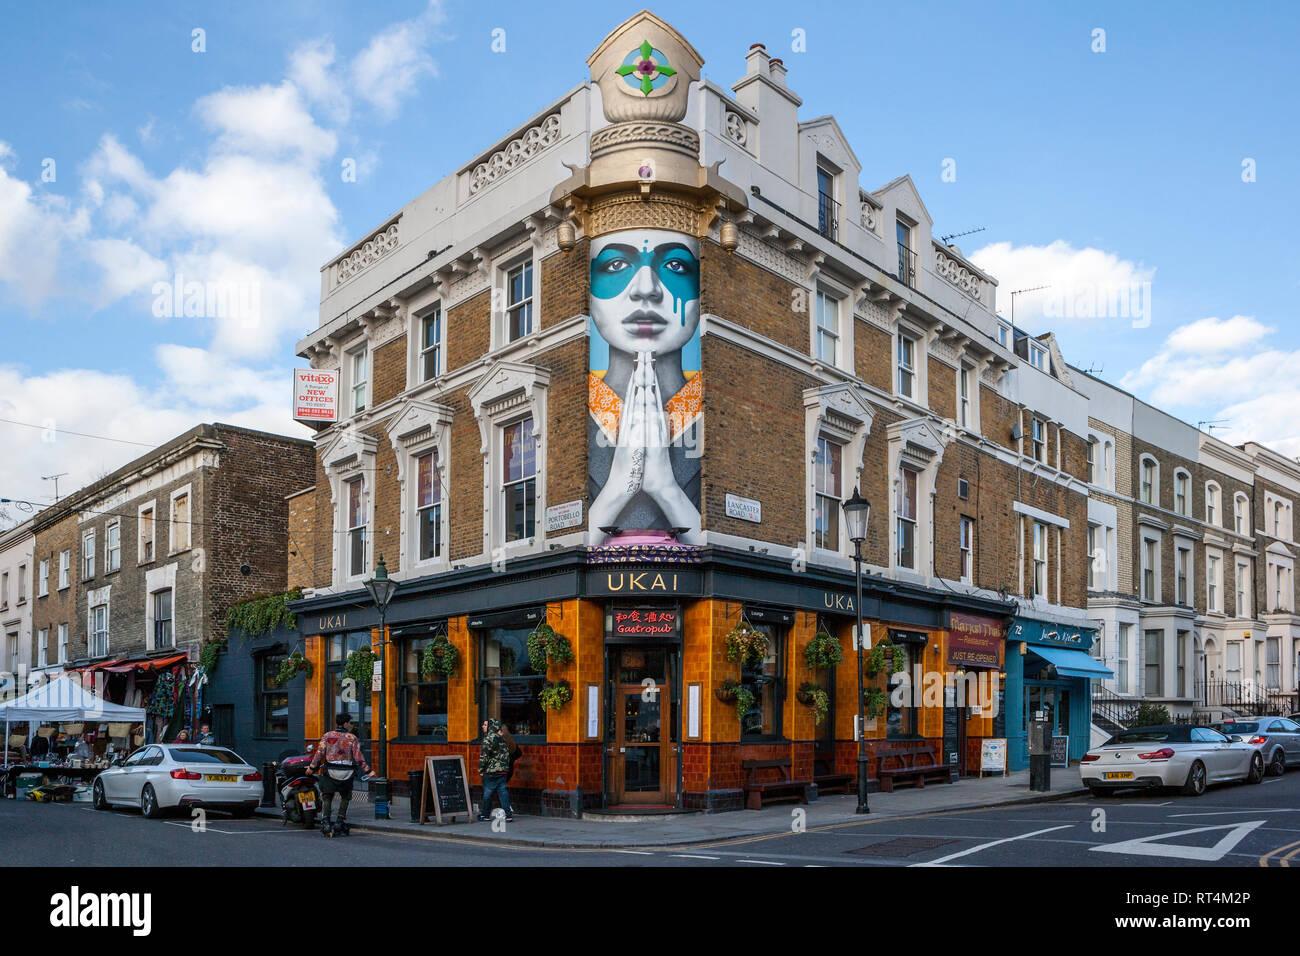 Ukai, Notting Hill, London - Stock Image